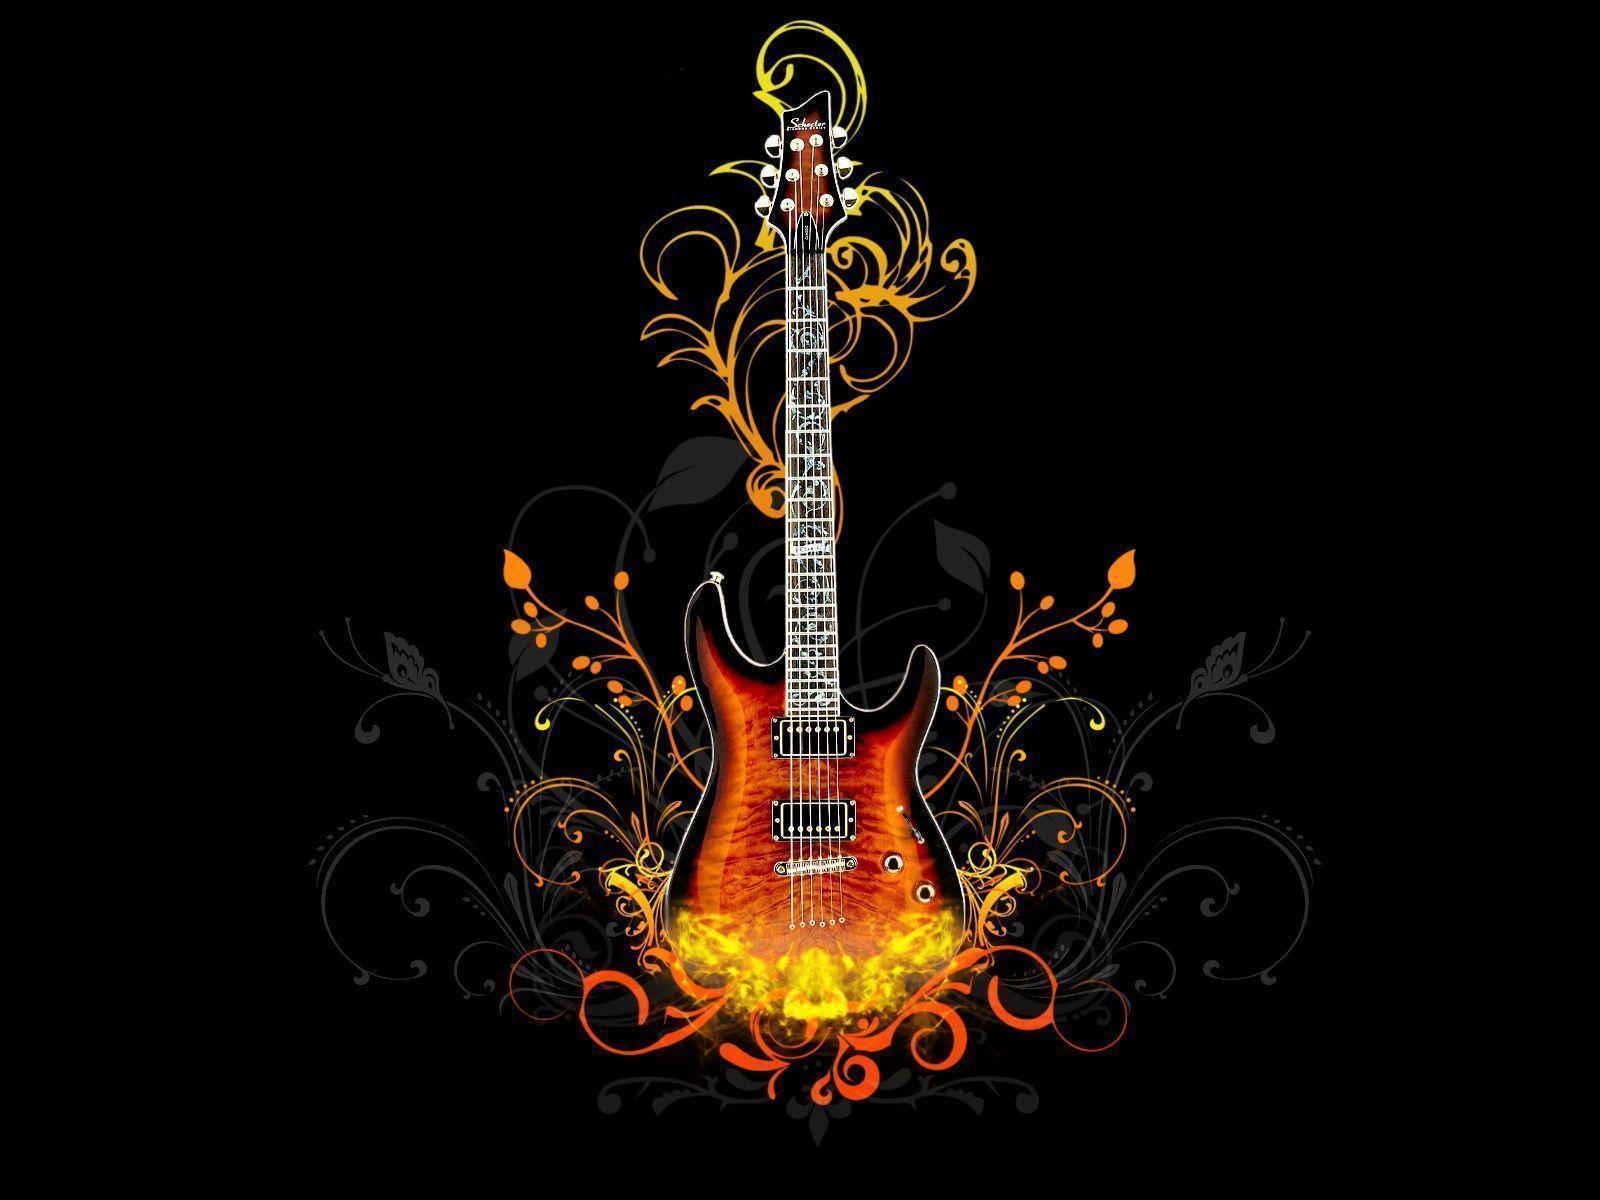 Guitar Image Hd Hd Background Wallpaper 38 HD Wallpapers | www ...